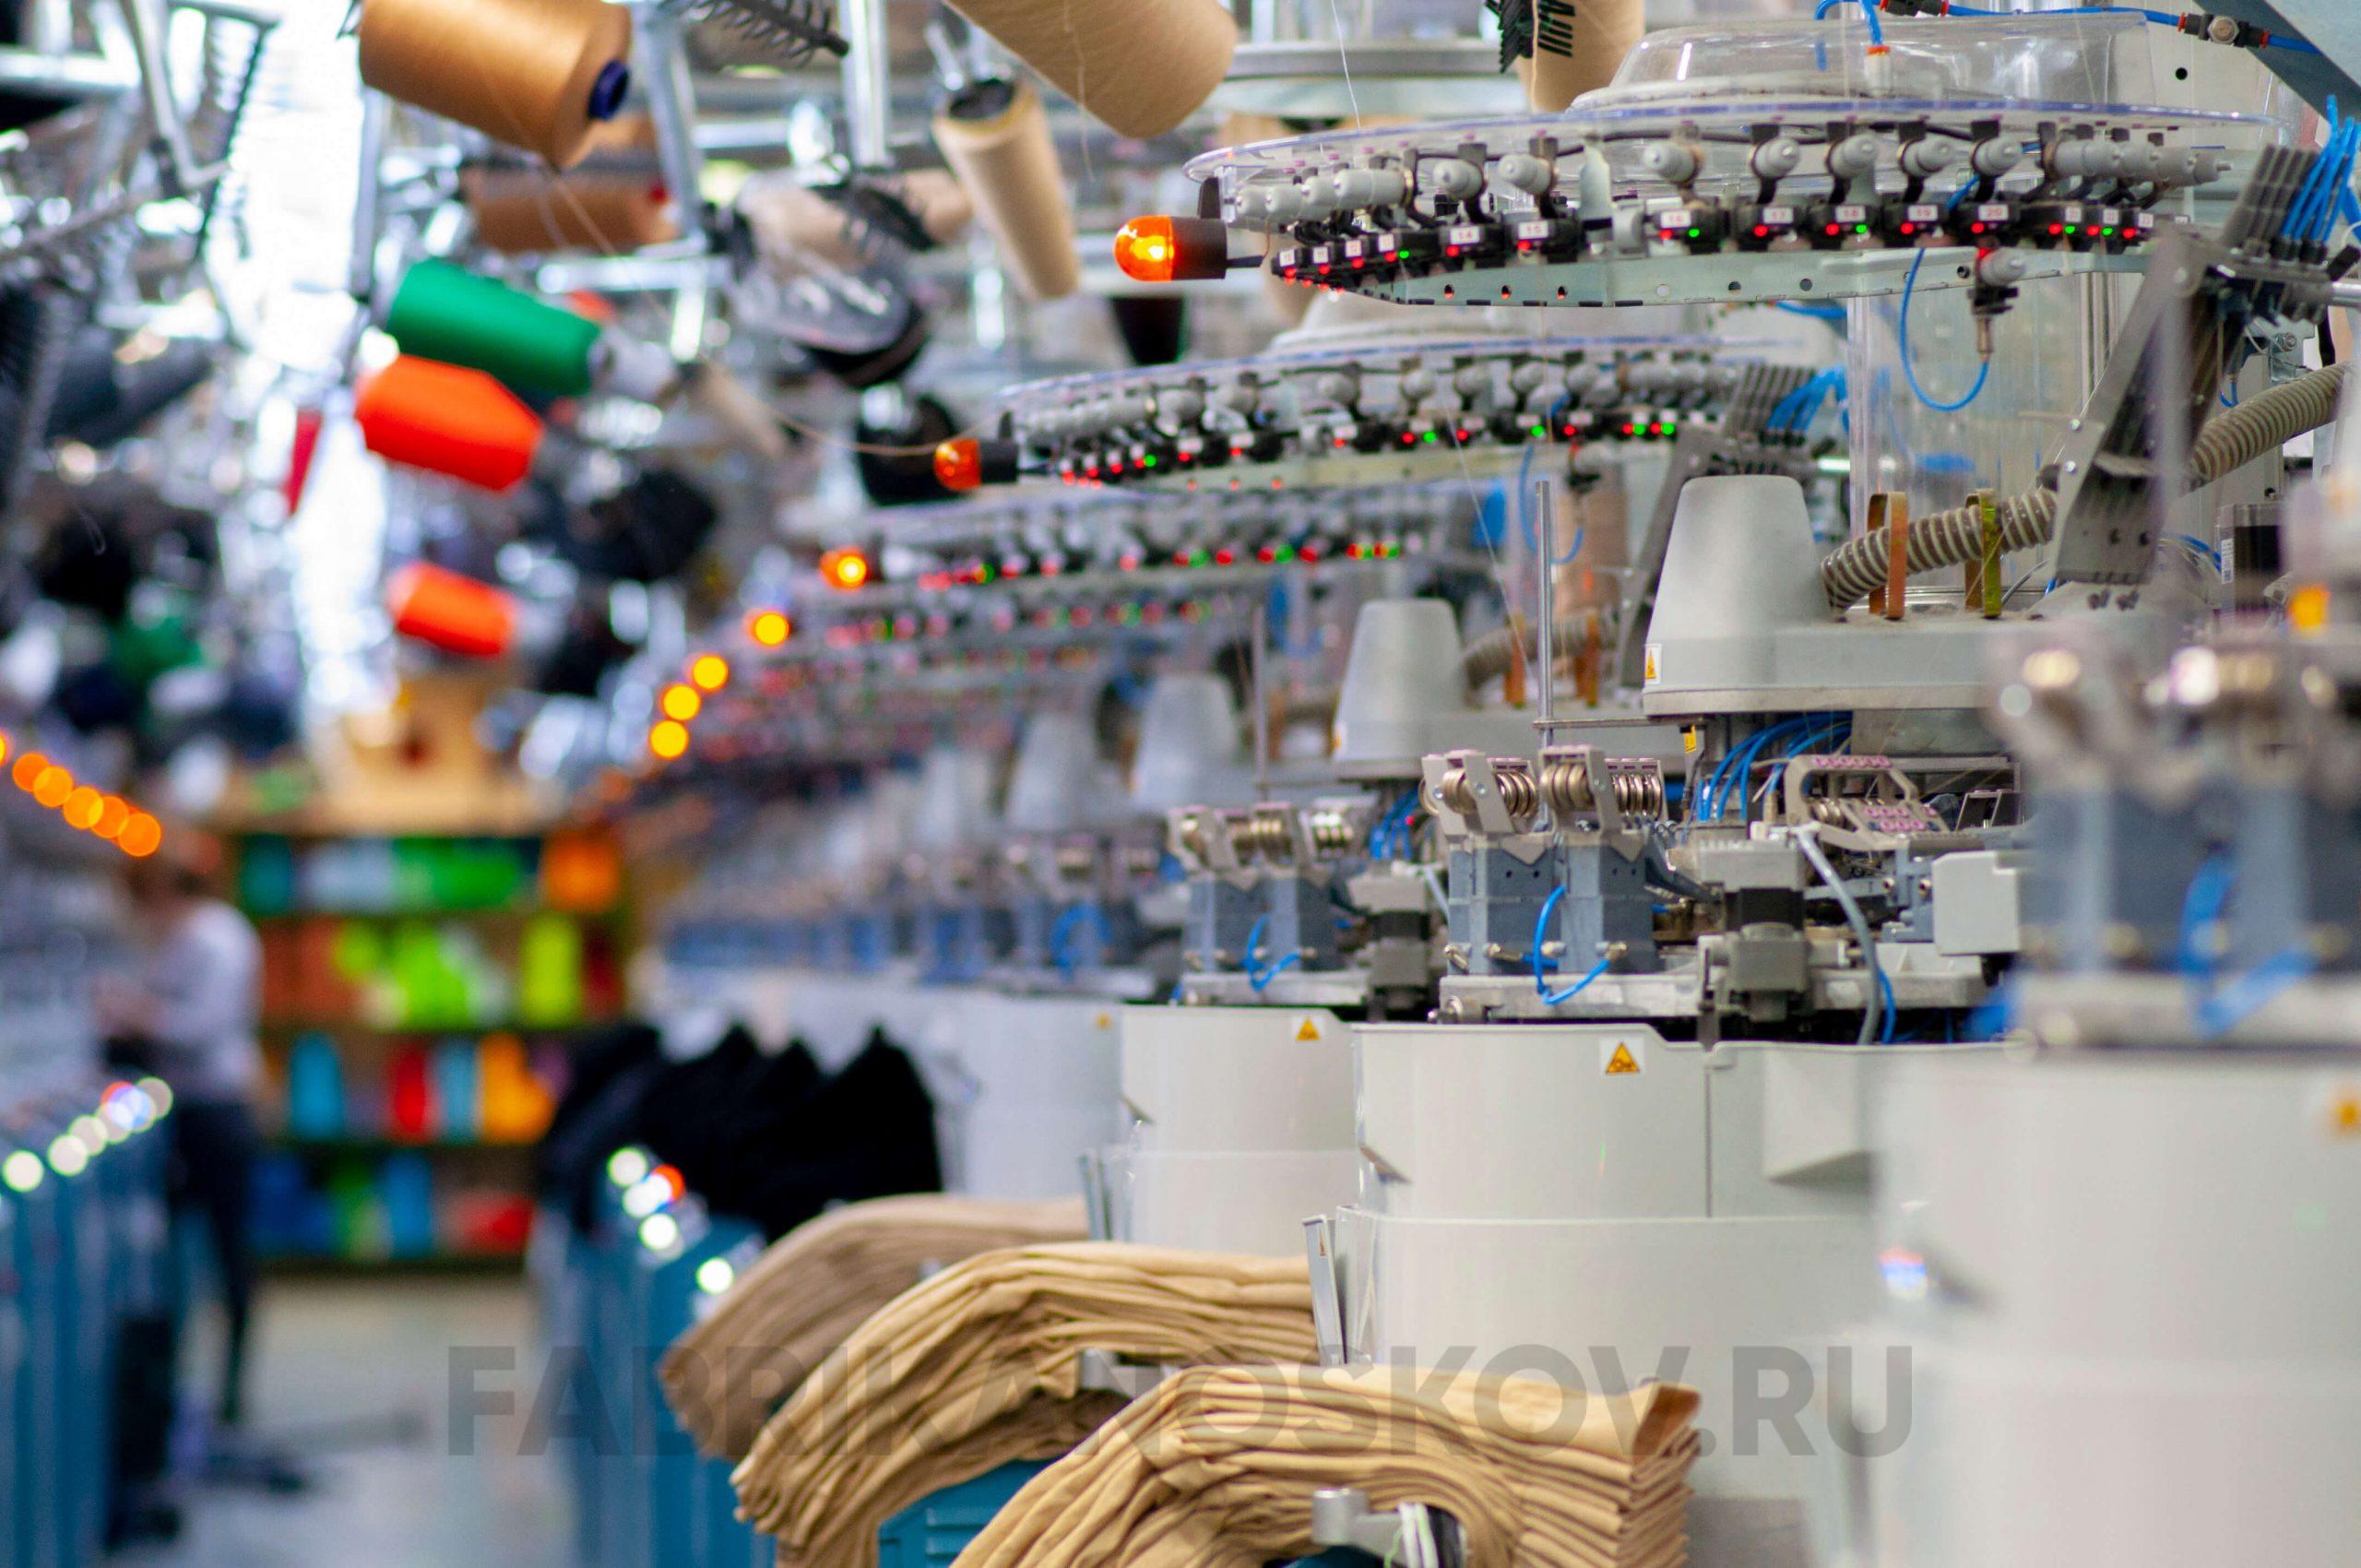 Производство носков, как бизнес